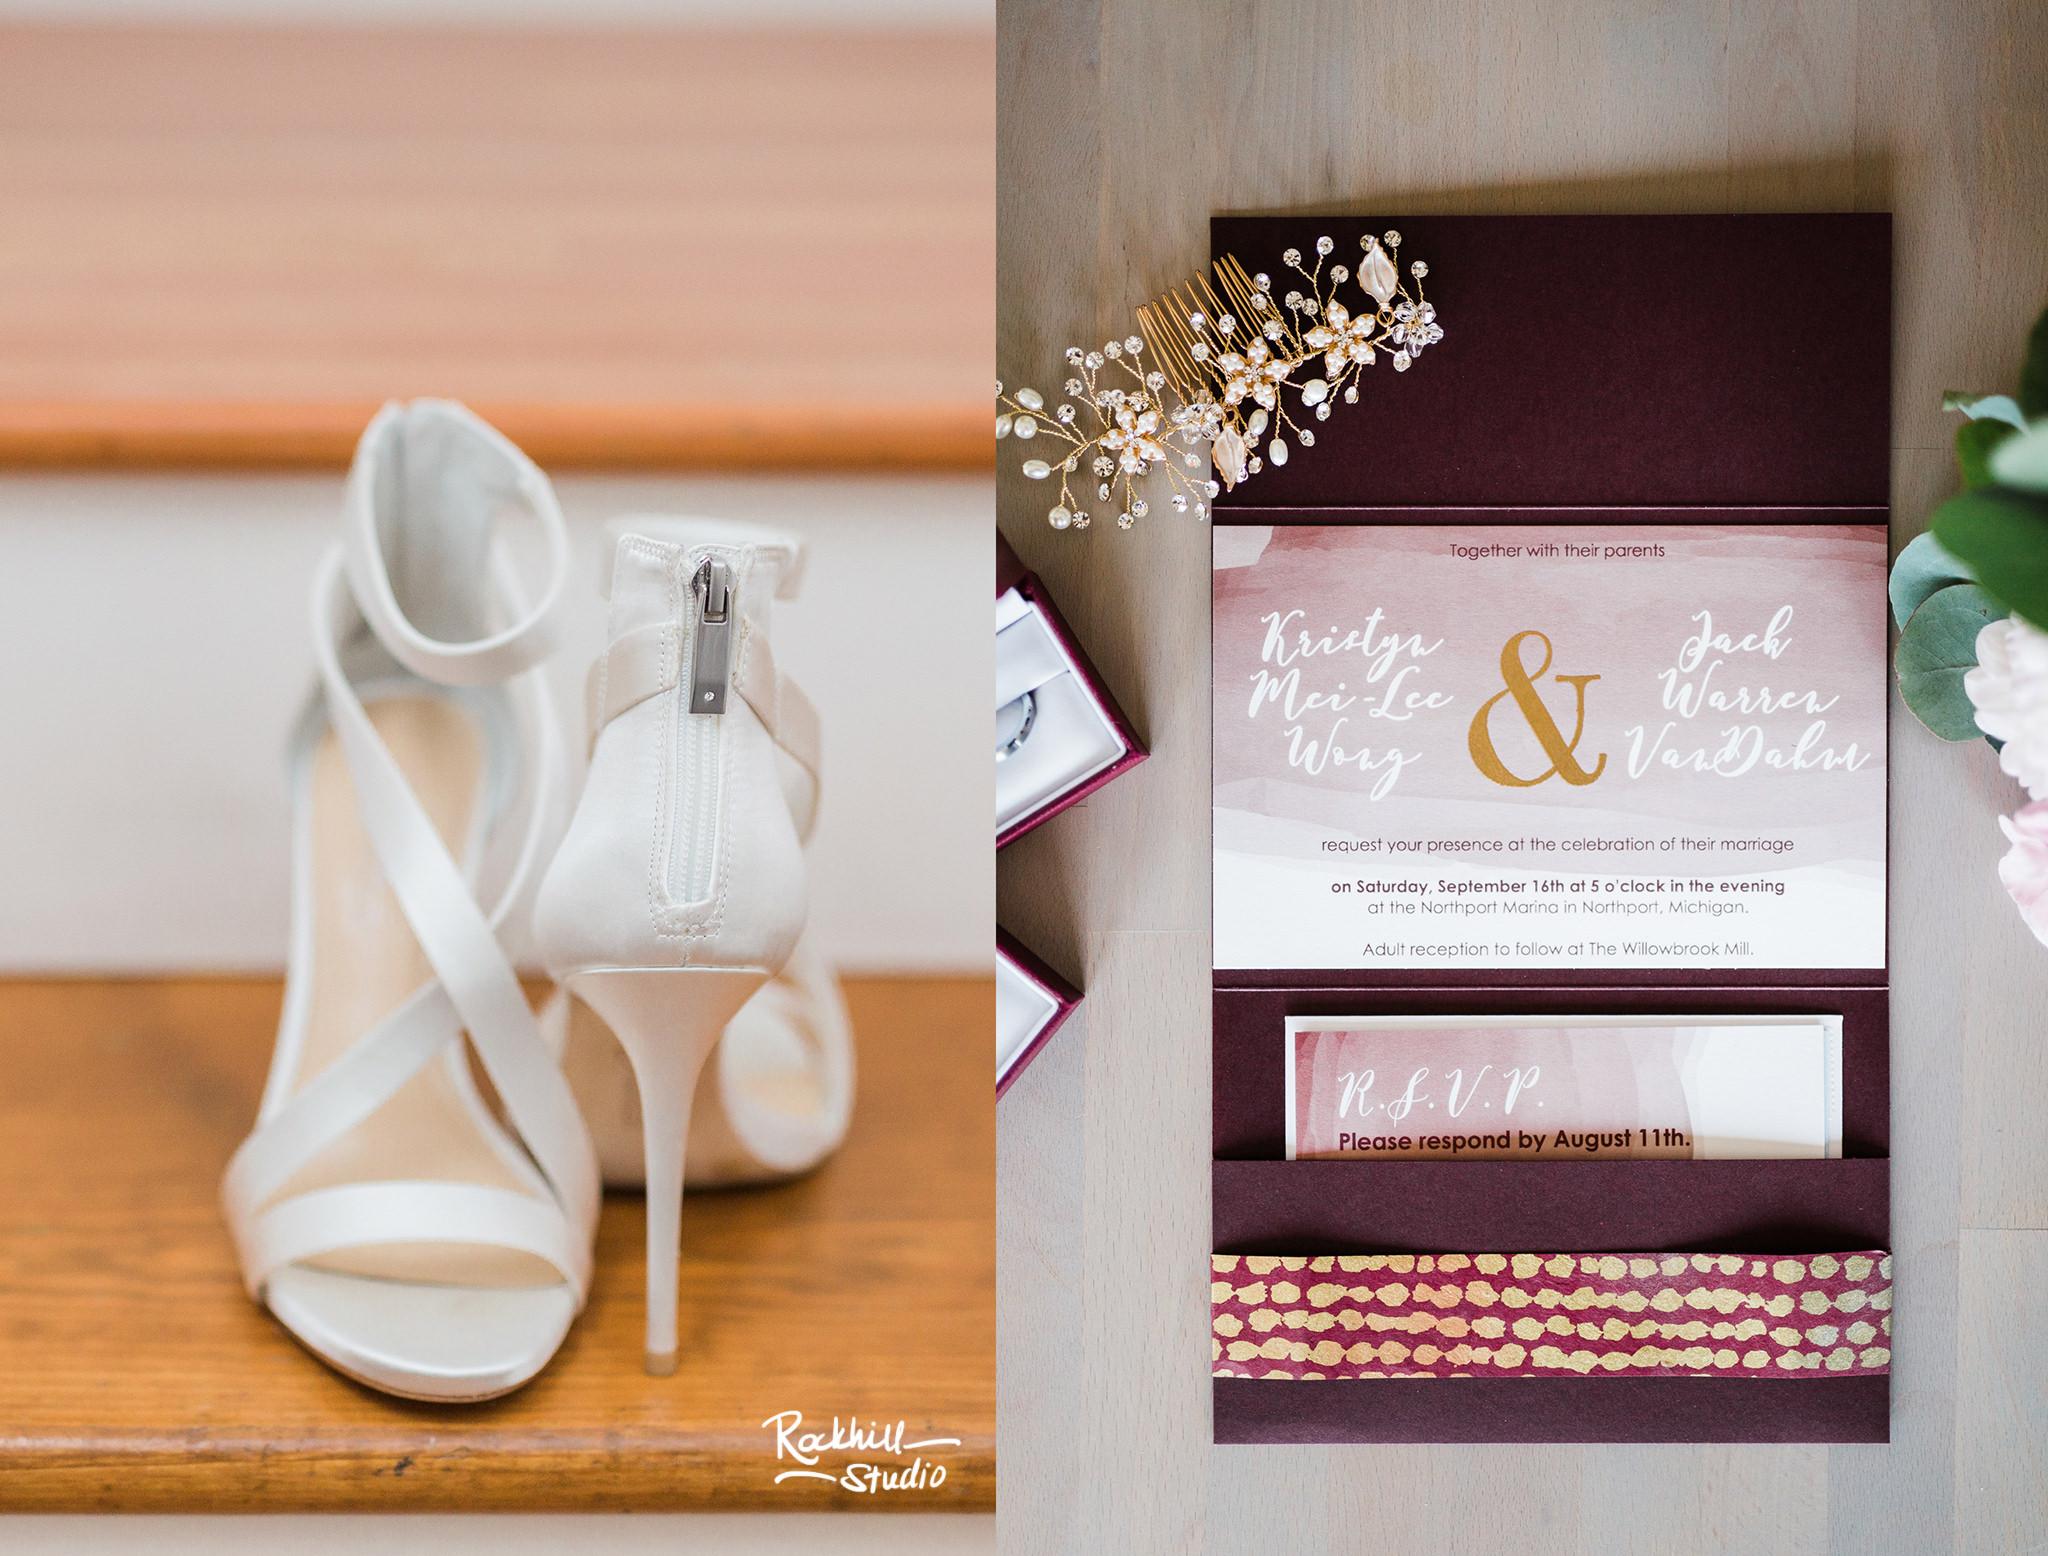 Northport Getting ready detail, wedding invitation,Traverse City wedding photographer Rockhill Studio